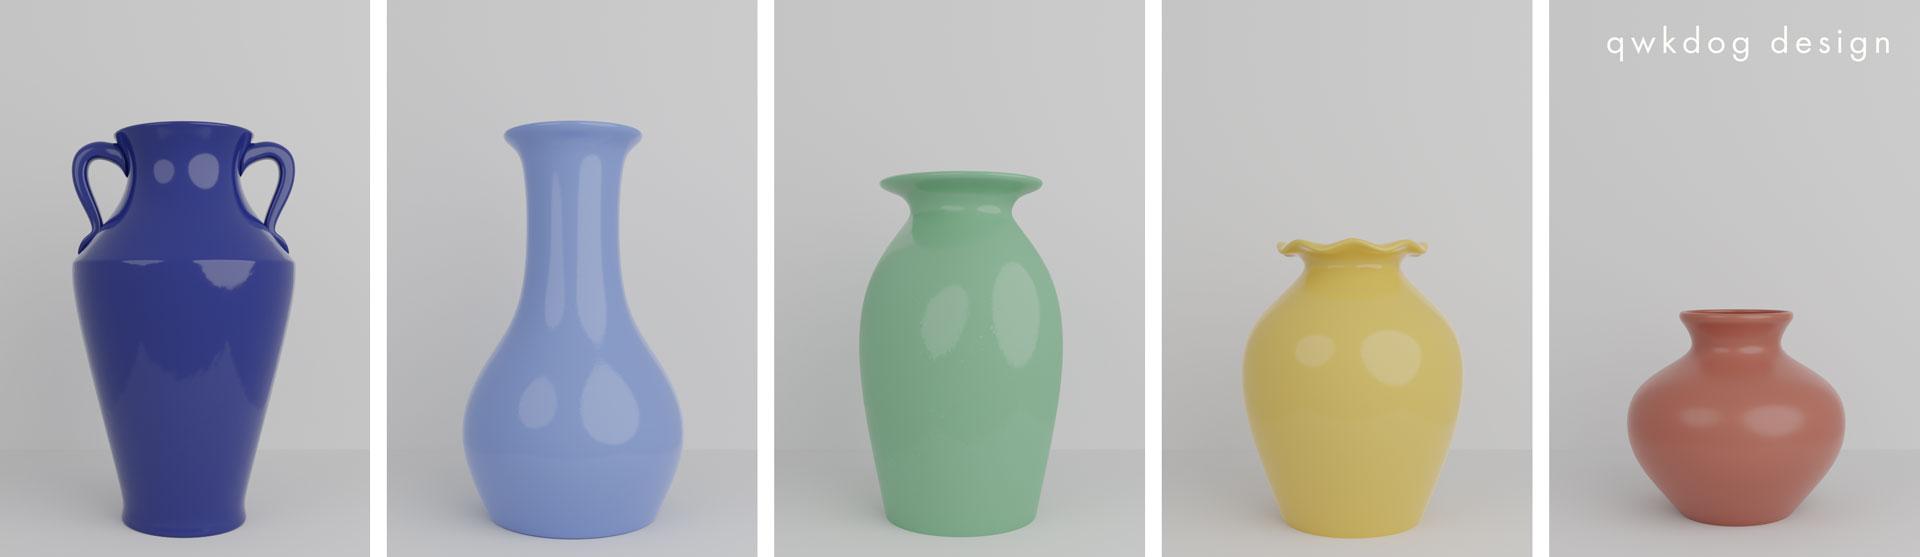 QwkDog 3D Pacific Pottery Artware Vases